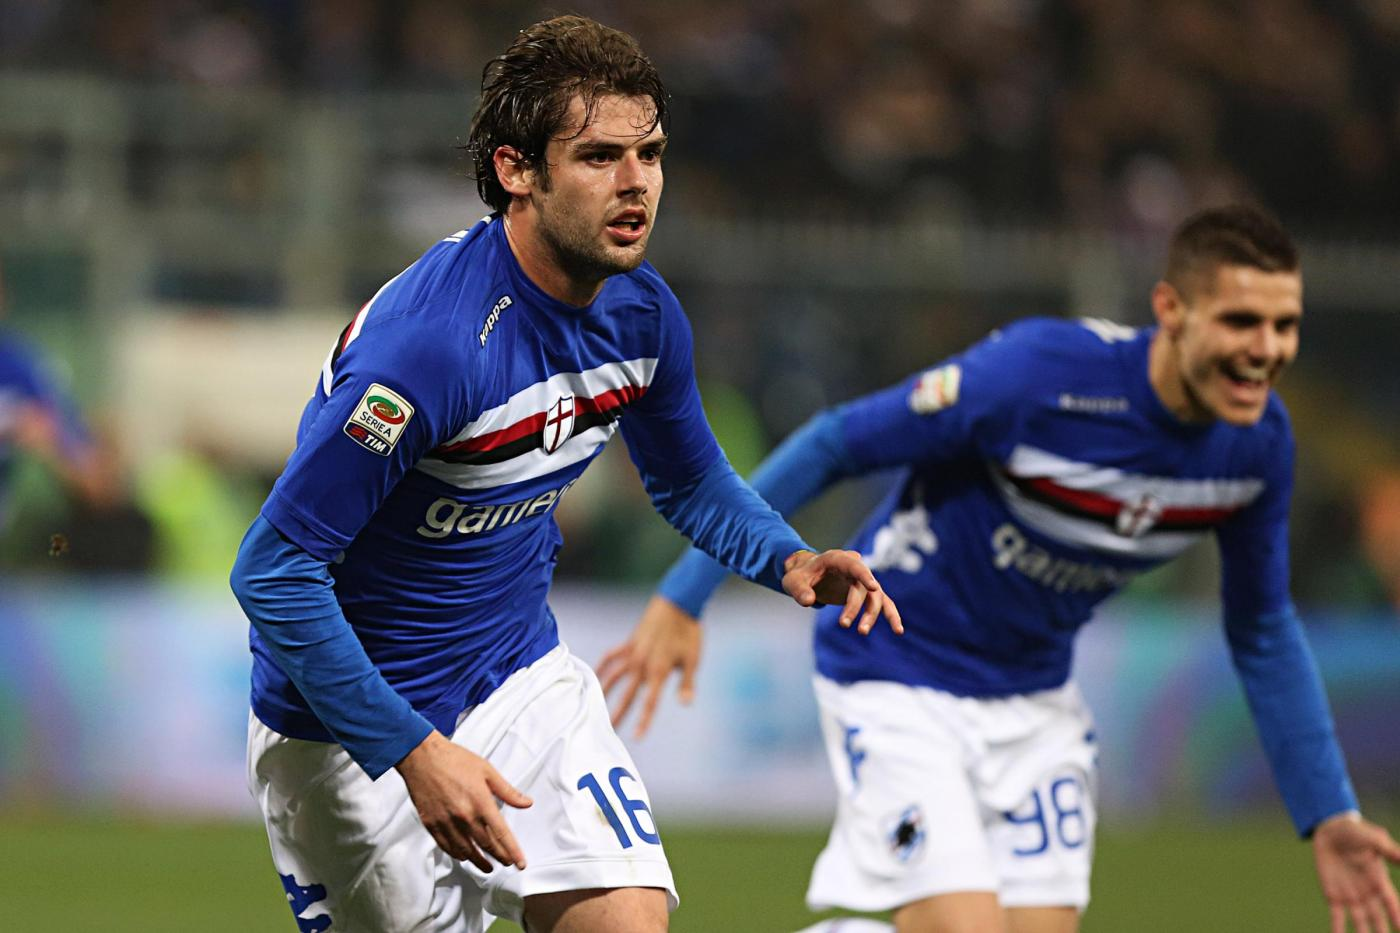 Poli: All'Inter ho vissuto momenti assurdi, pensavo di essere su Scherzi a Parte